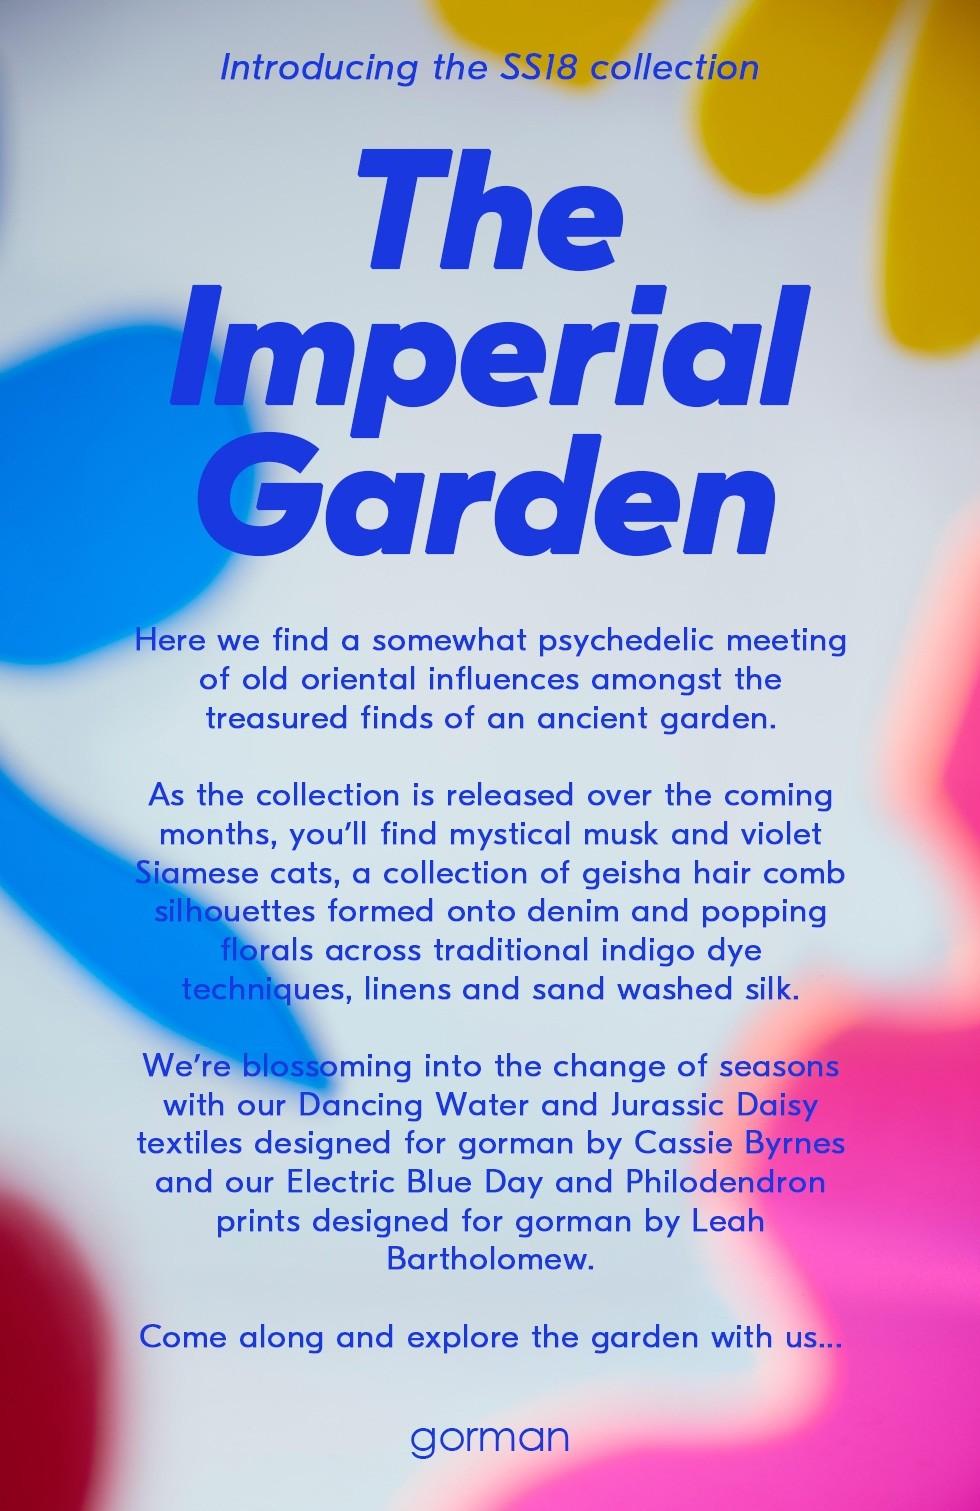 The Imperial Garden